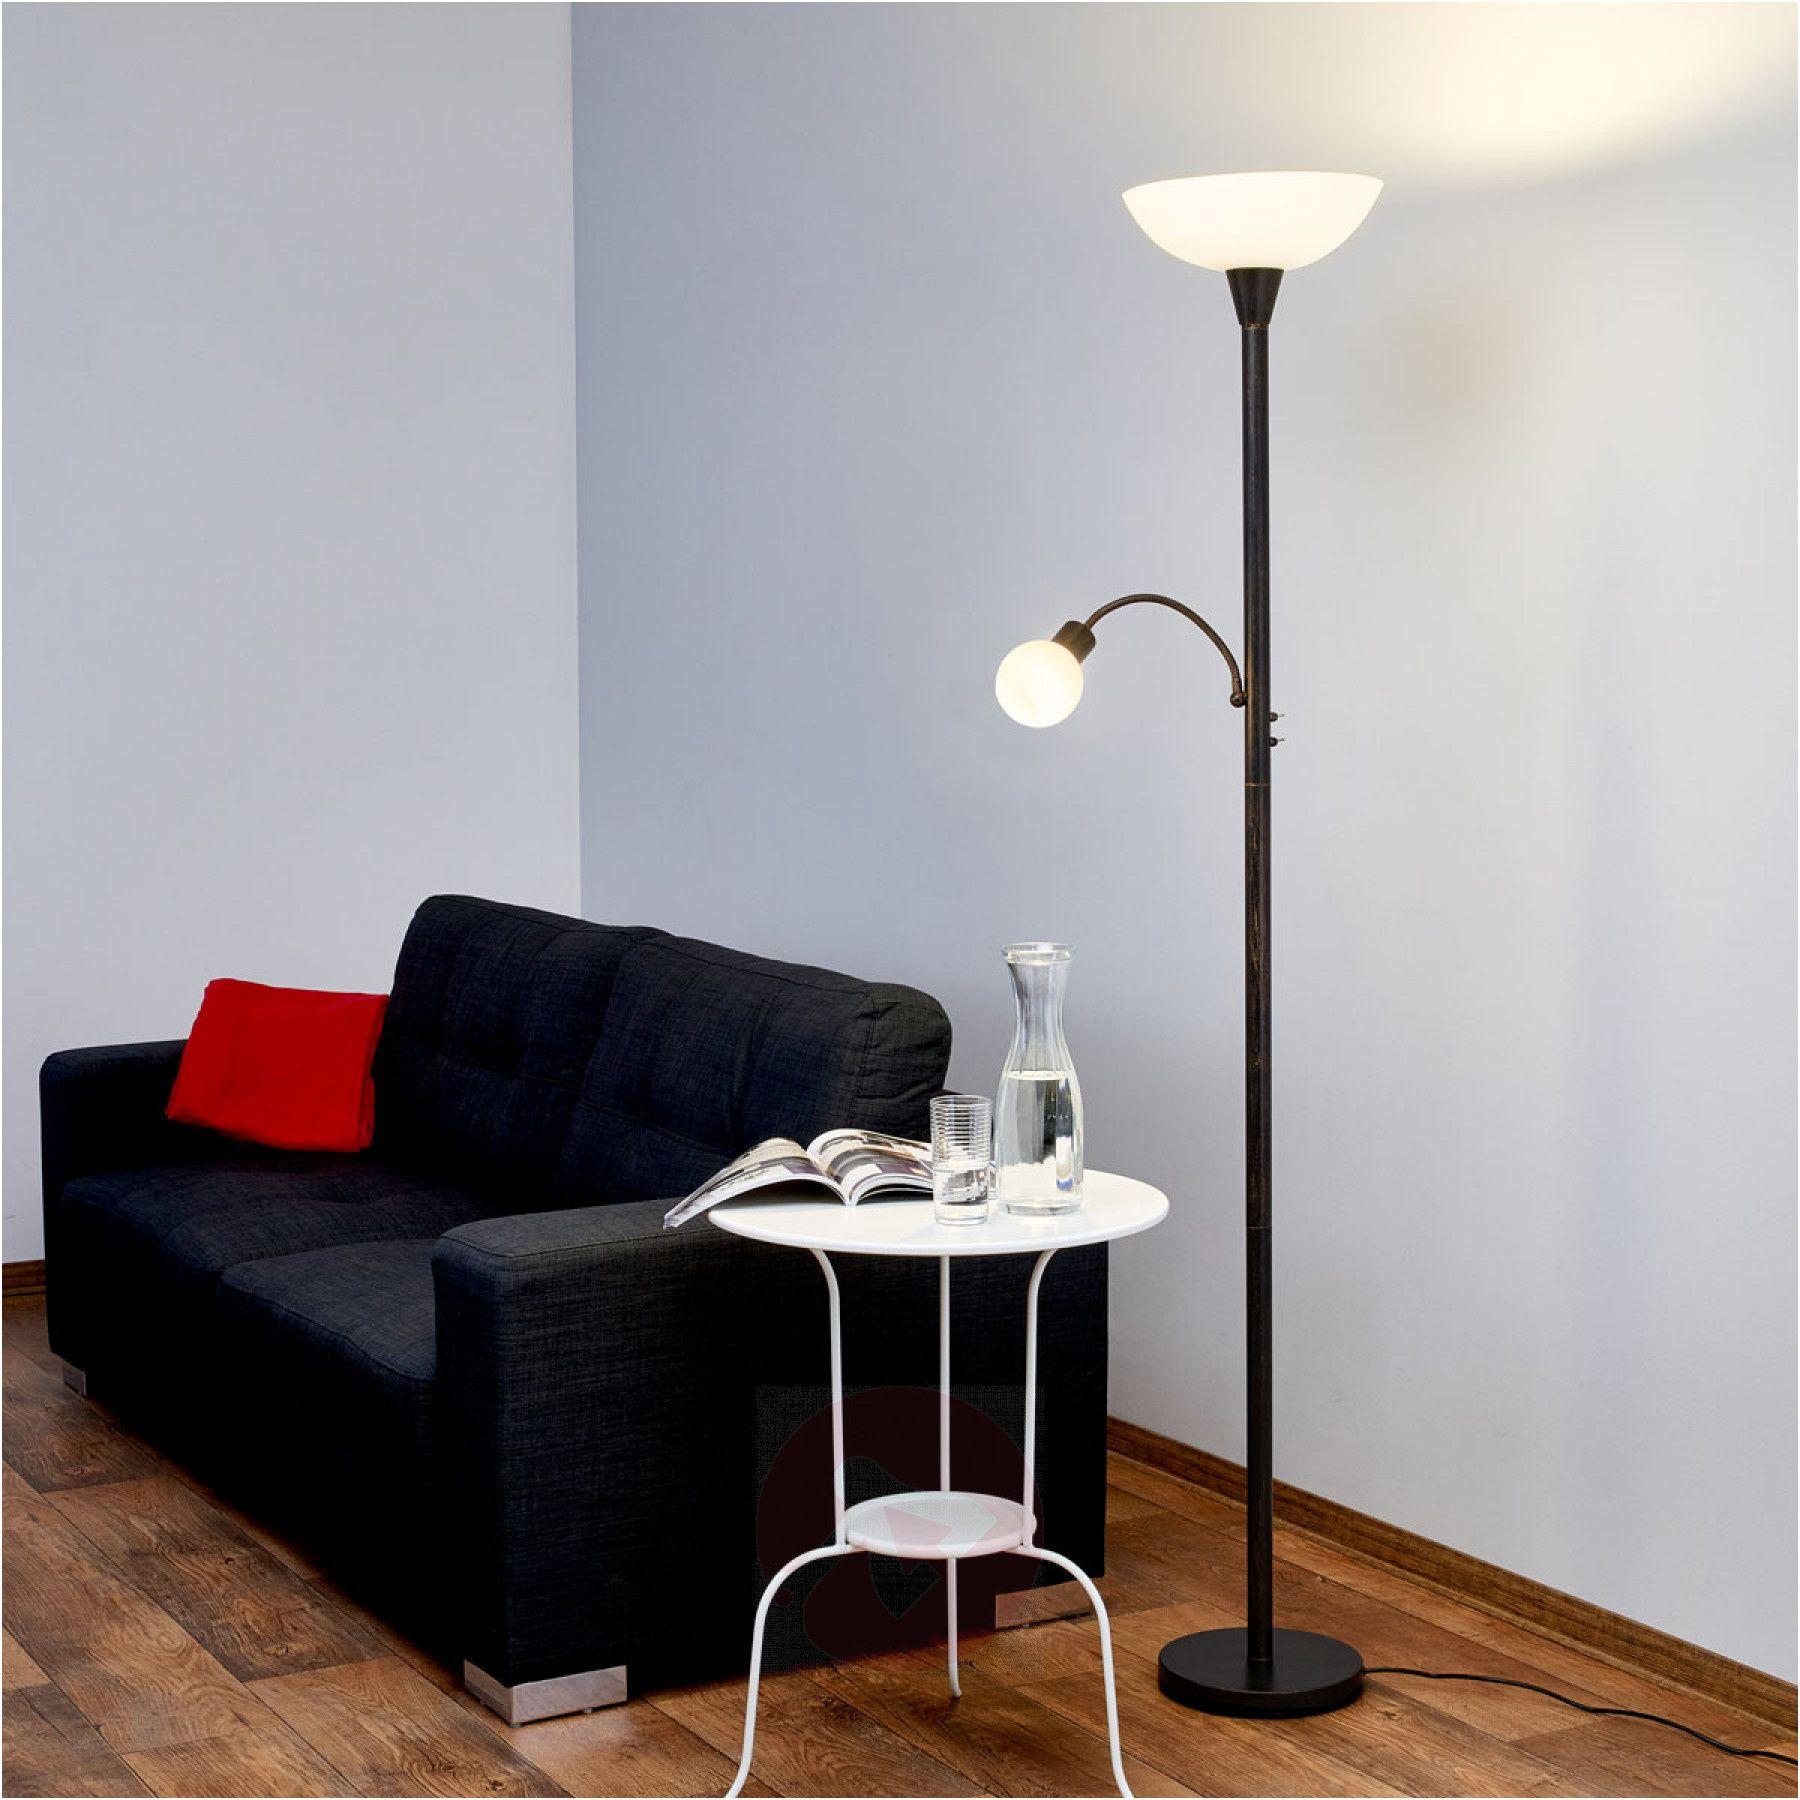 16 Rustique Luminaire Fr Gallery